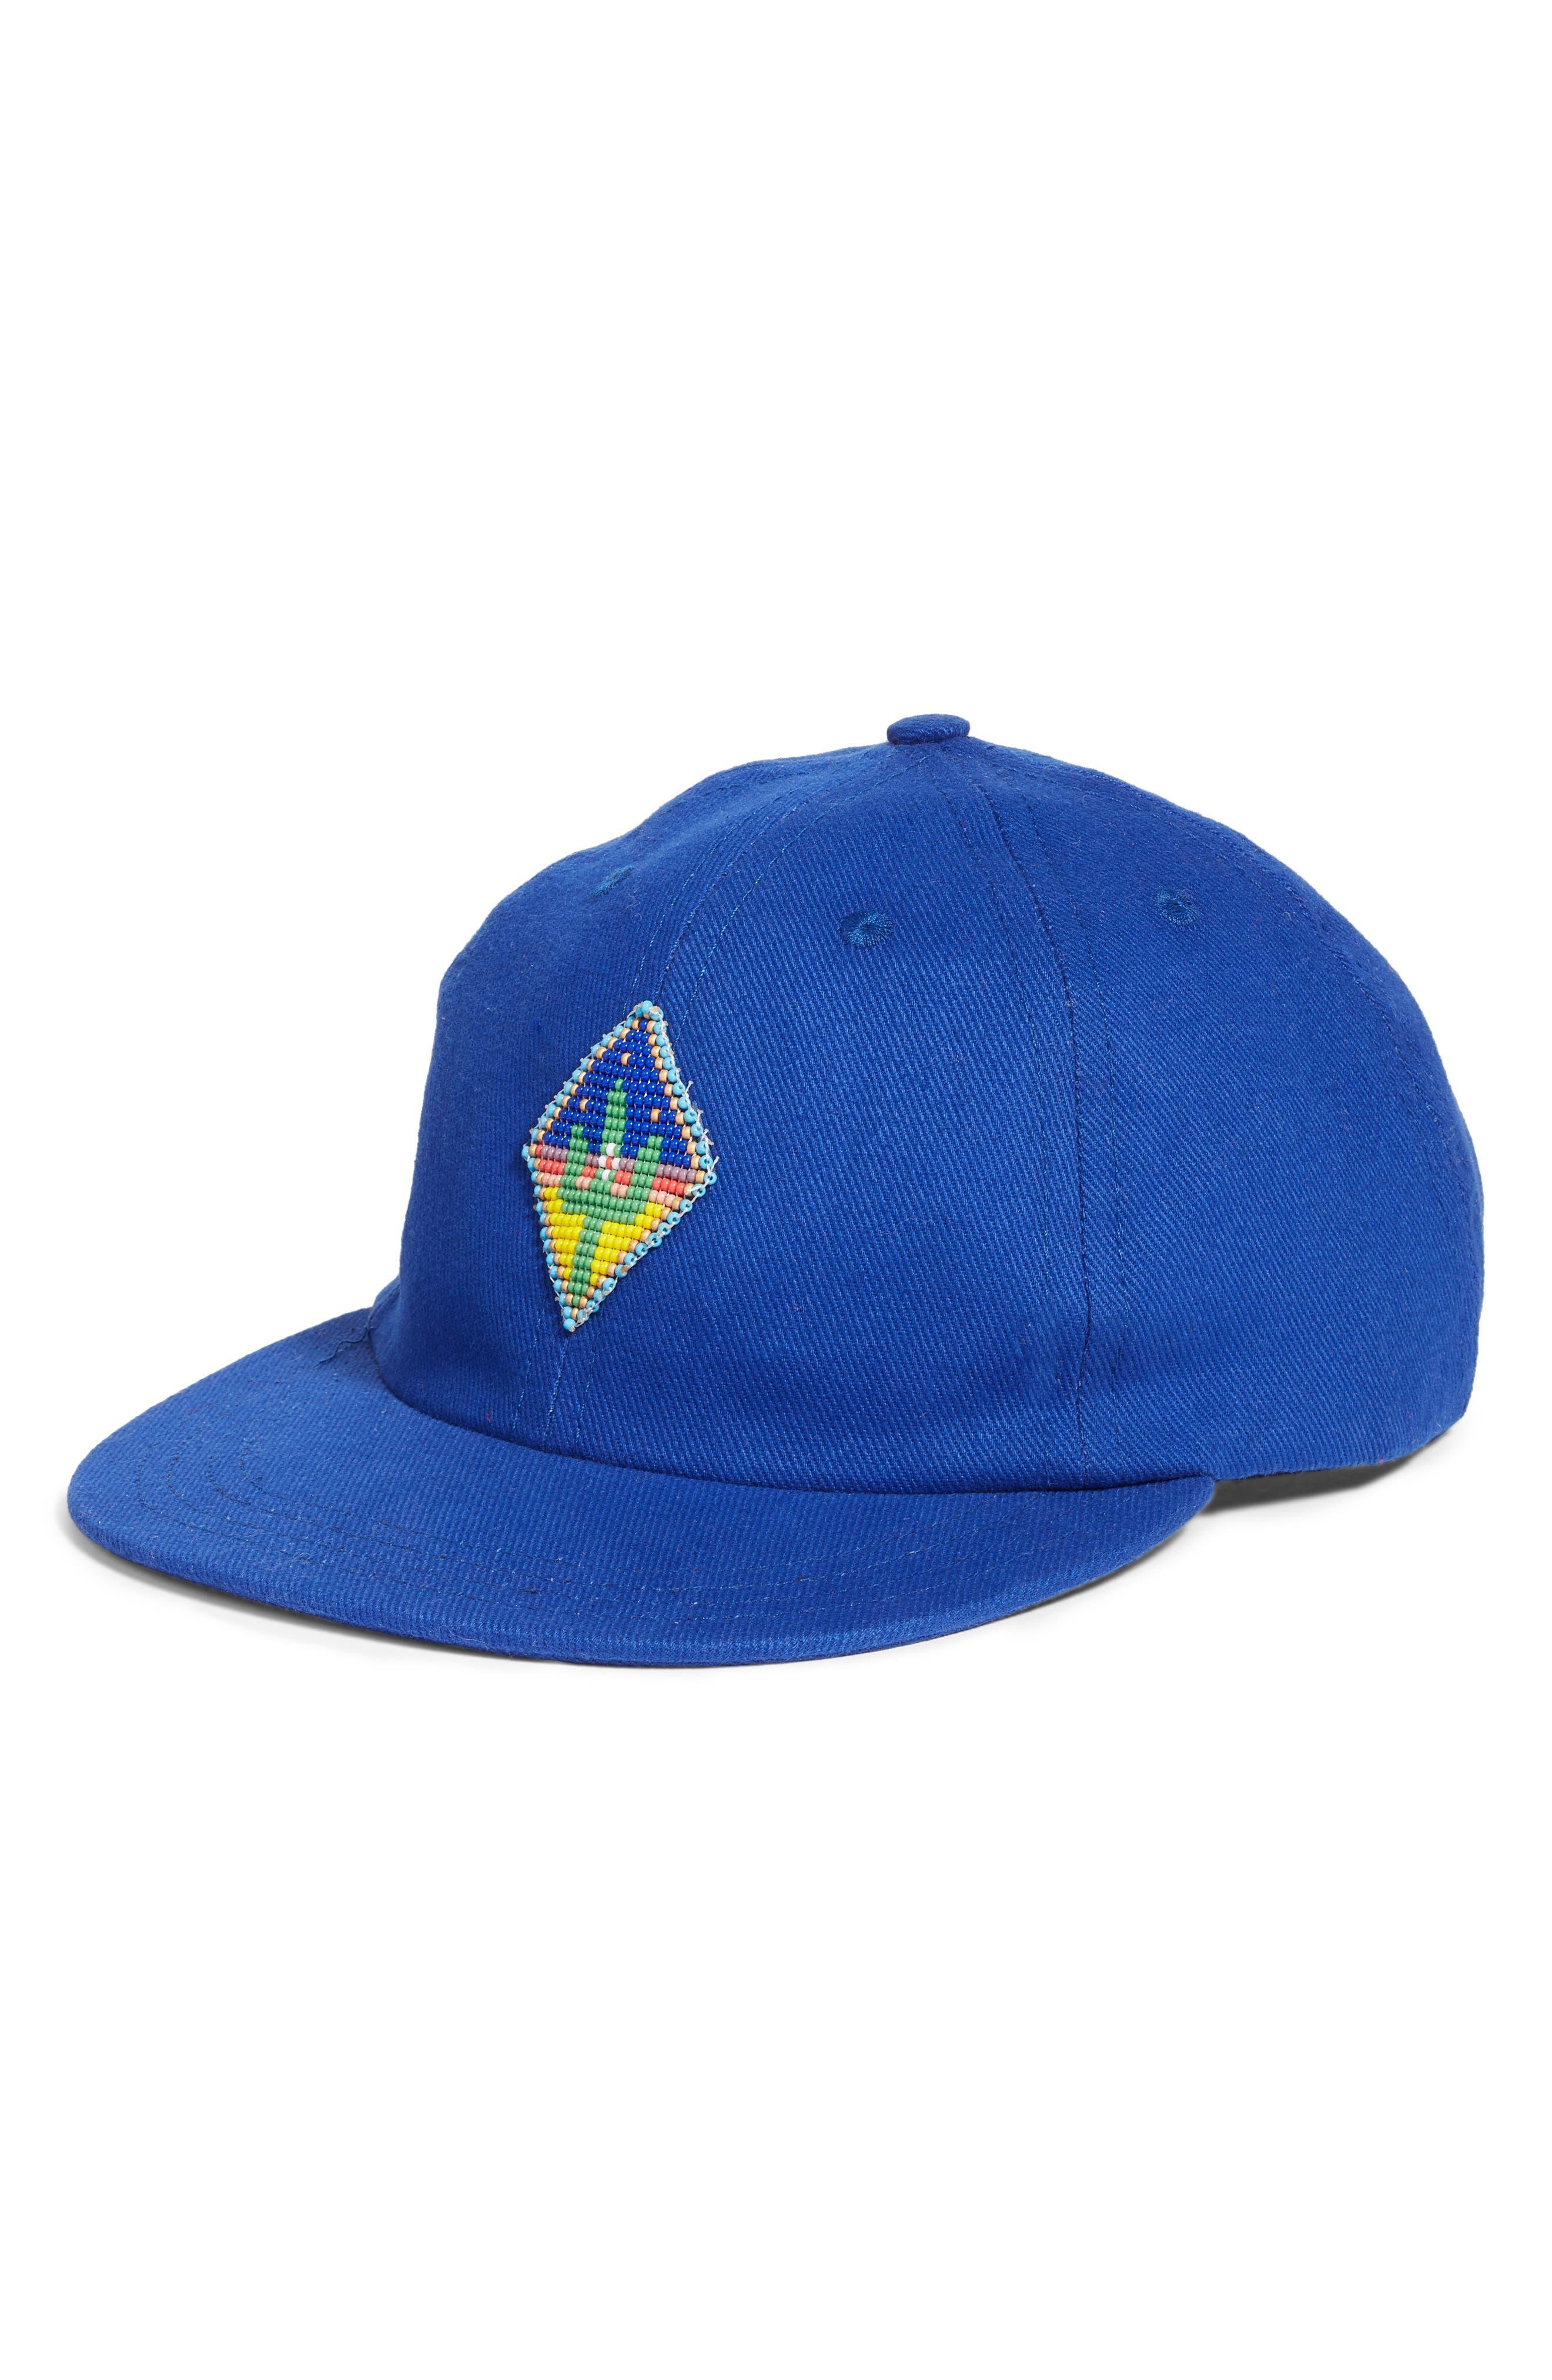 Beaded Cactus Baseball Hat,                         Main,                         color, 400